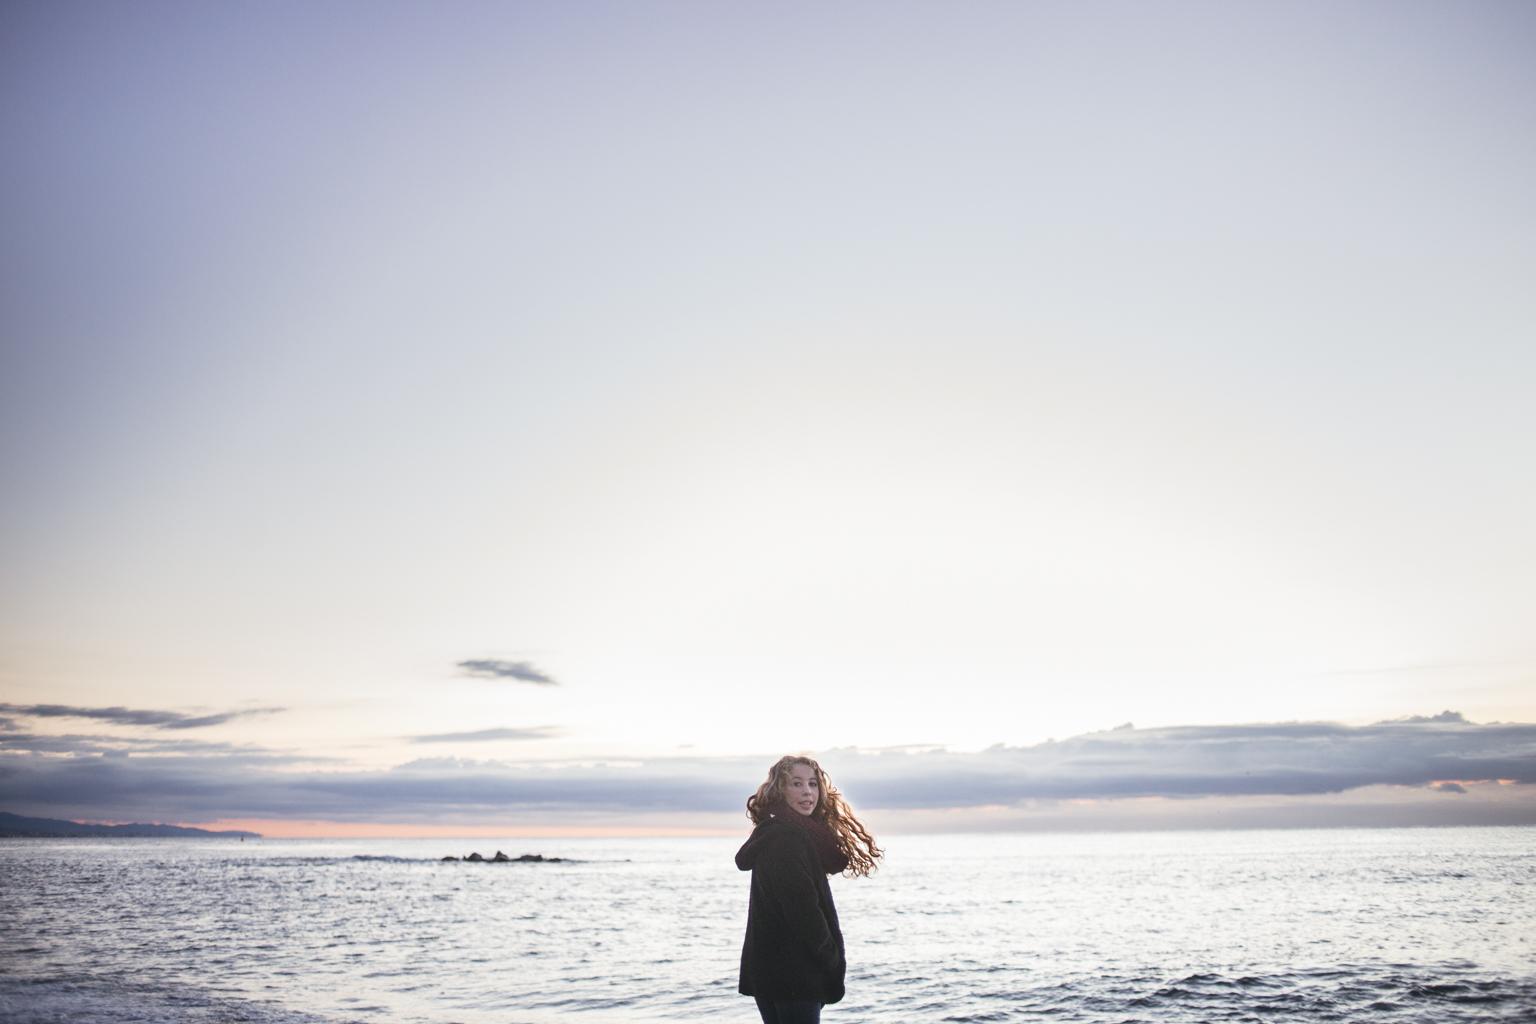 fotógrafo book personal barcelona :: amanecer en la playa :: fotografía book playa :: fotógrafo book playa